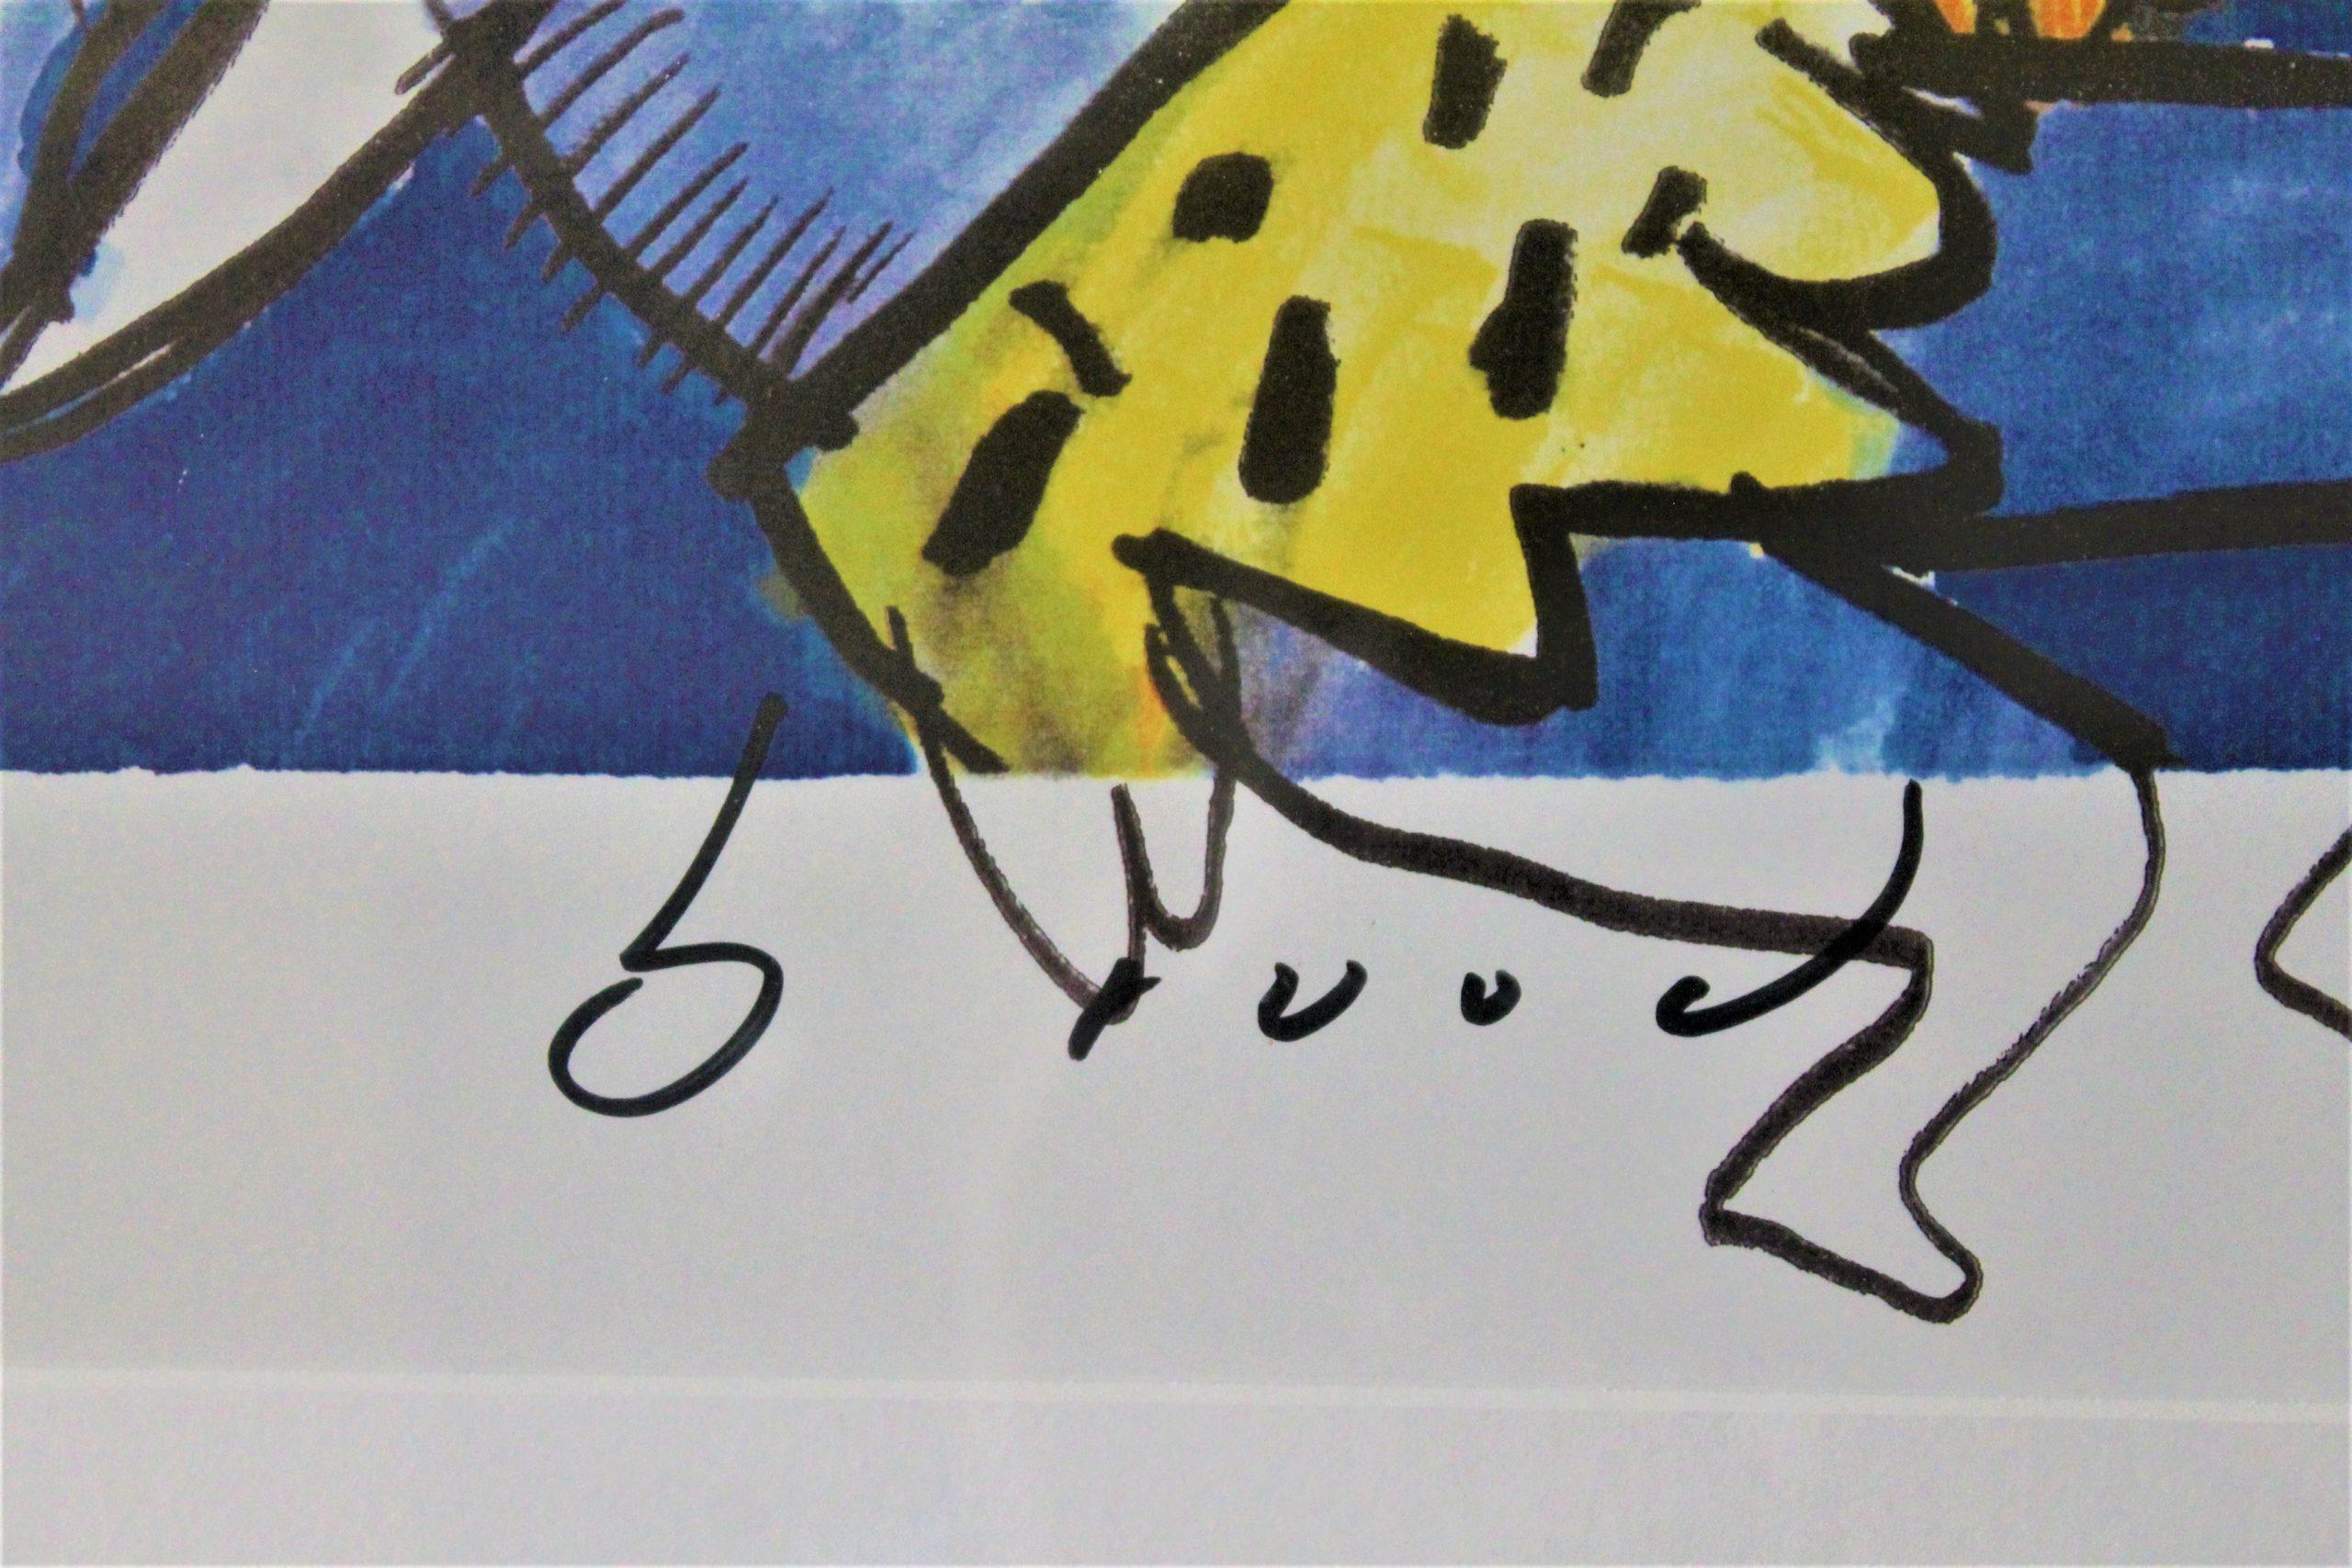 Tarzan and the lion king handtekening Herman Brood